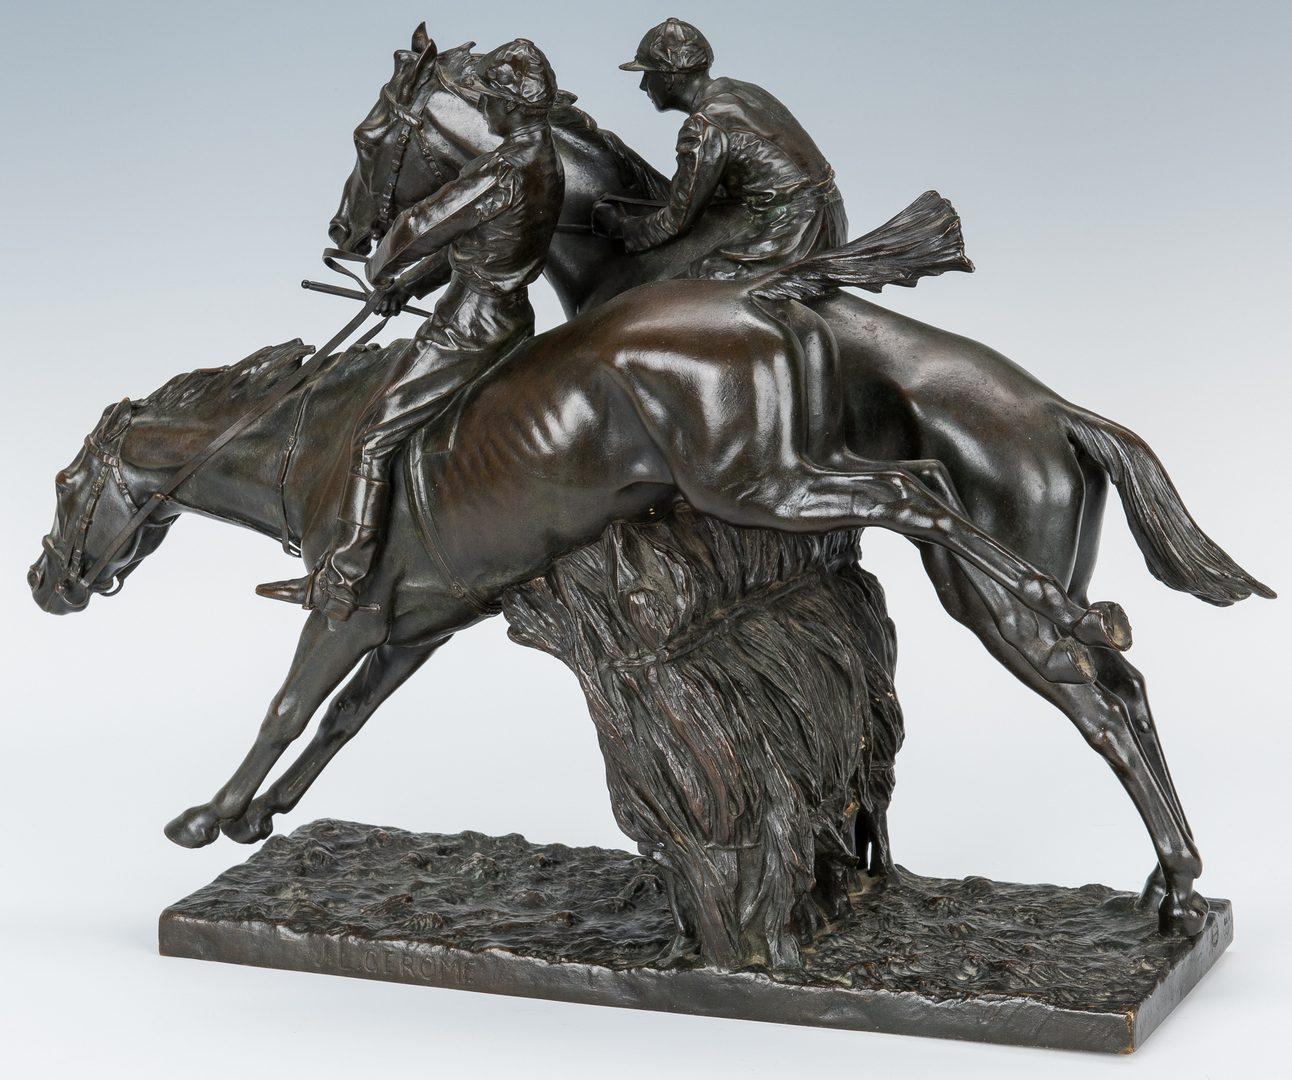 Lot 106: Jean-Leon Gerome Bronze Sculpture, Jockeys on Horseback